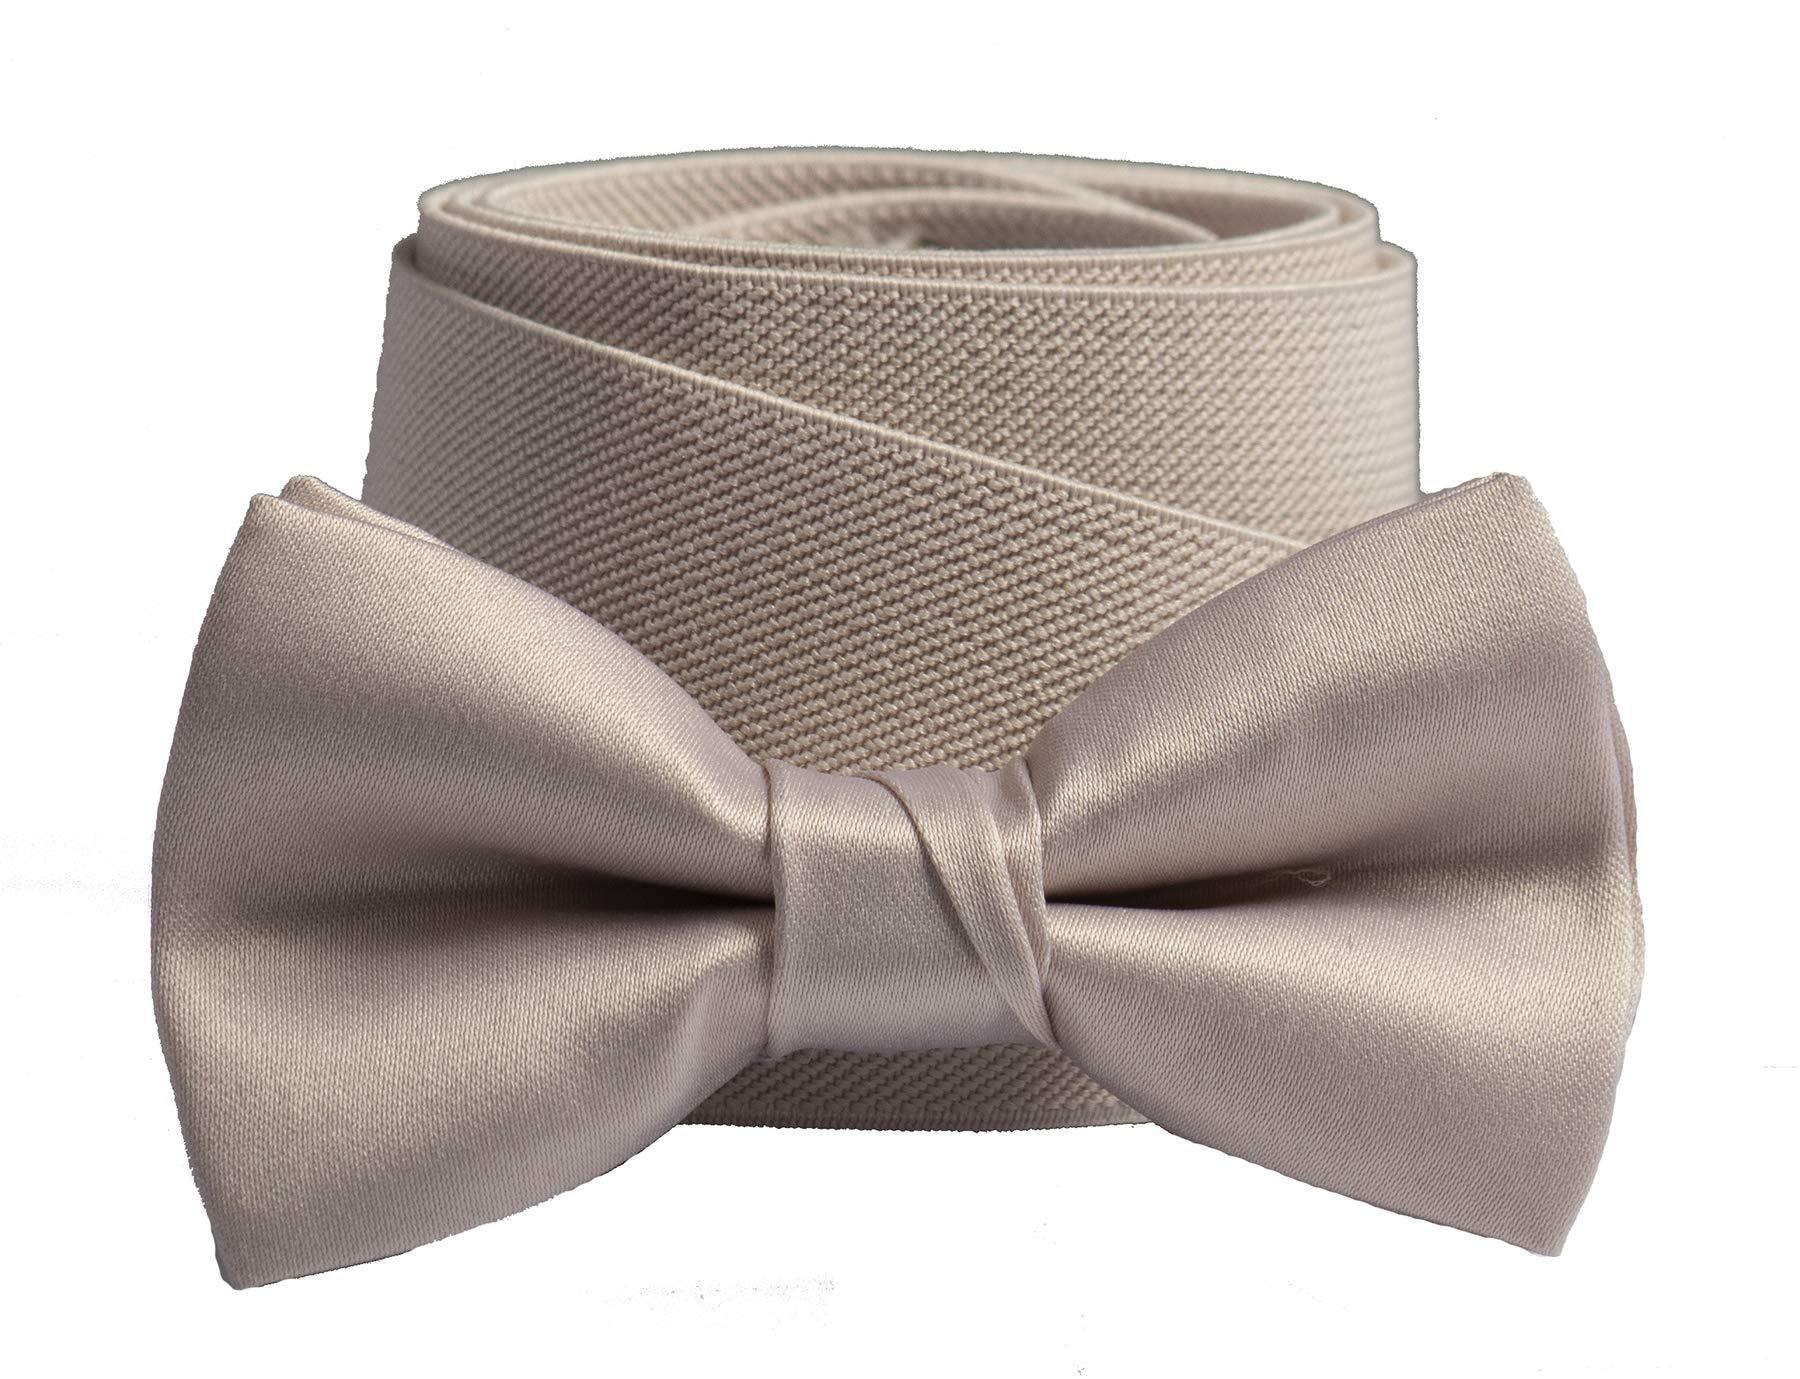 Tuxgear Boys Matching Adjustable Suspender and Bow Tie, Blush, Boys 30'' (Blush, Boys 30'')